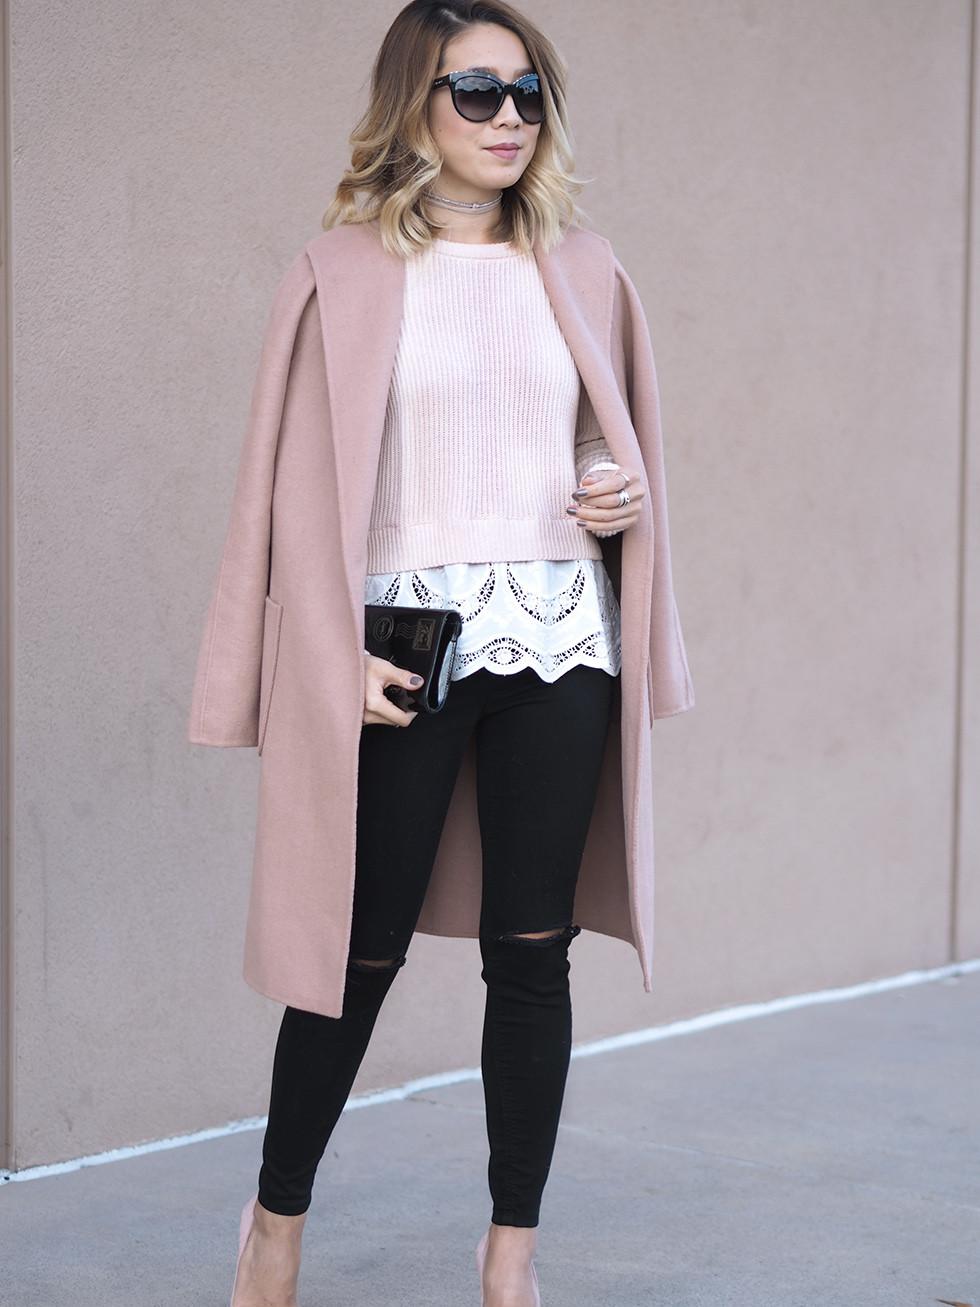 Blush Pink Coat | Lam in Louboutins